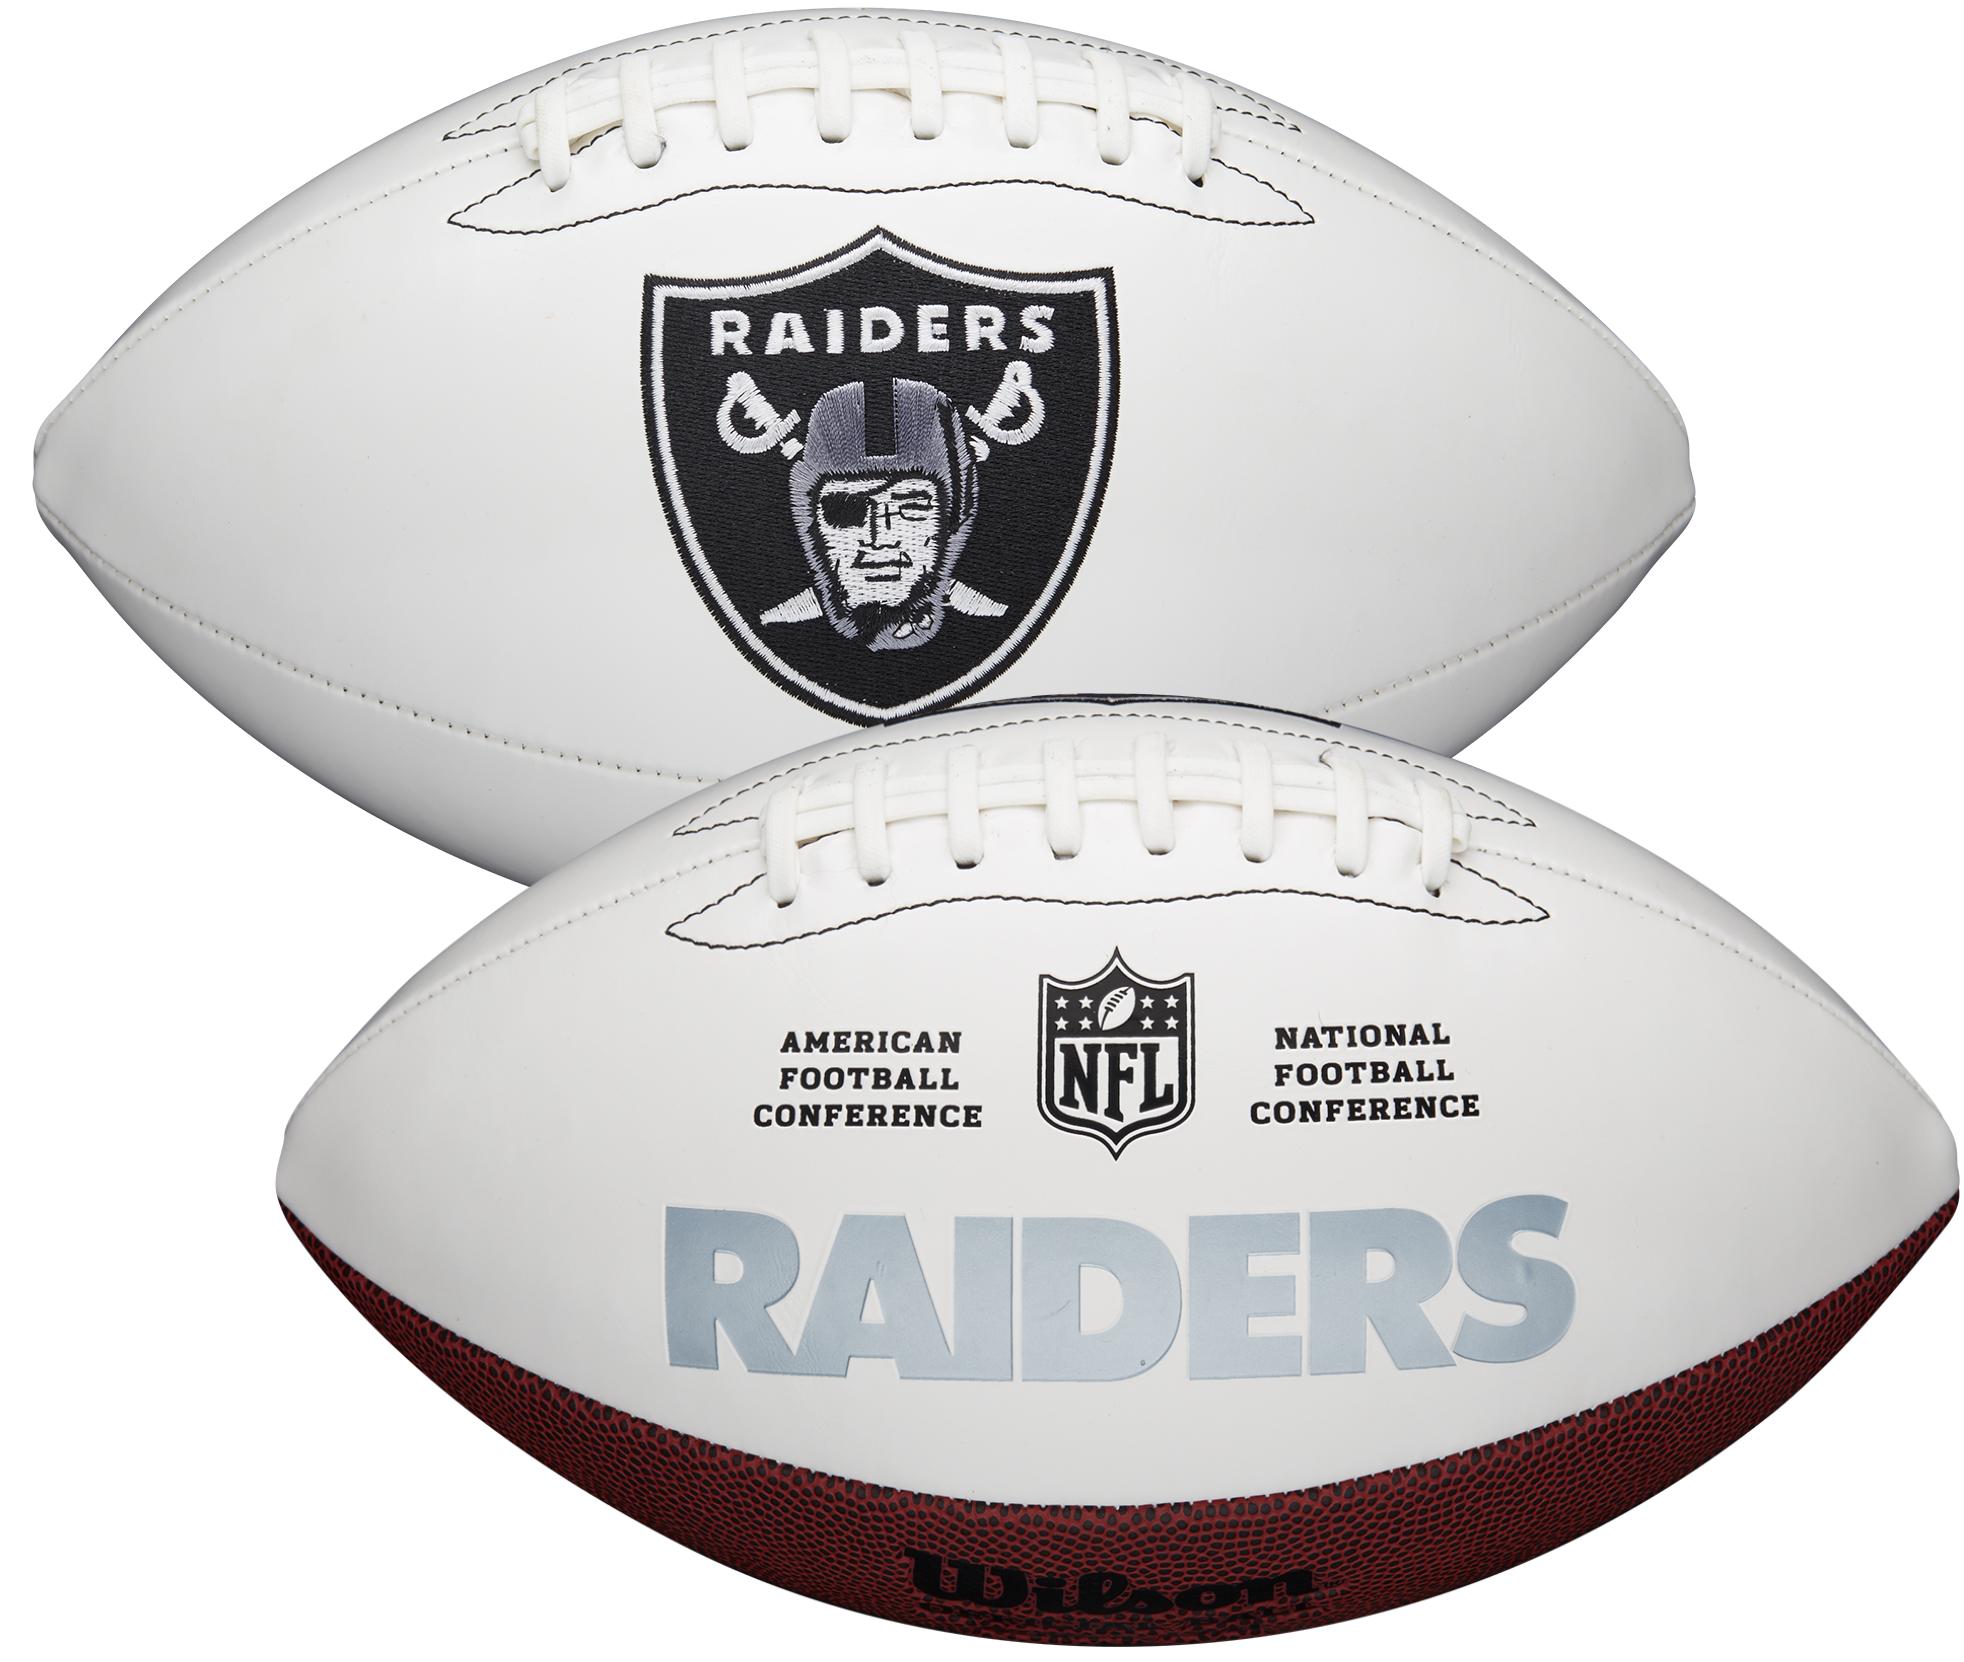 Wilson Las Vegas Raiders Official NFL Autograph Series Football